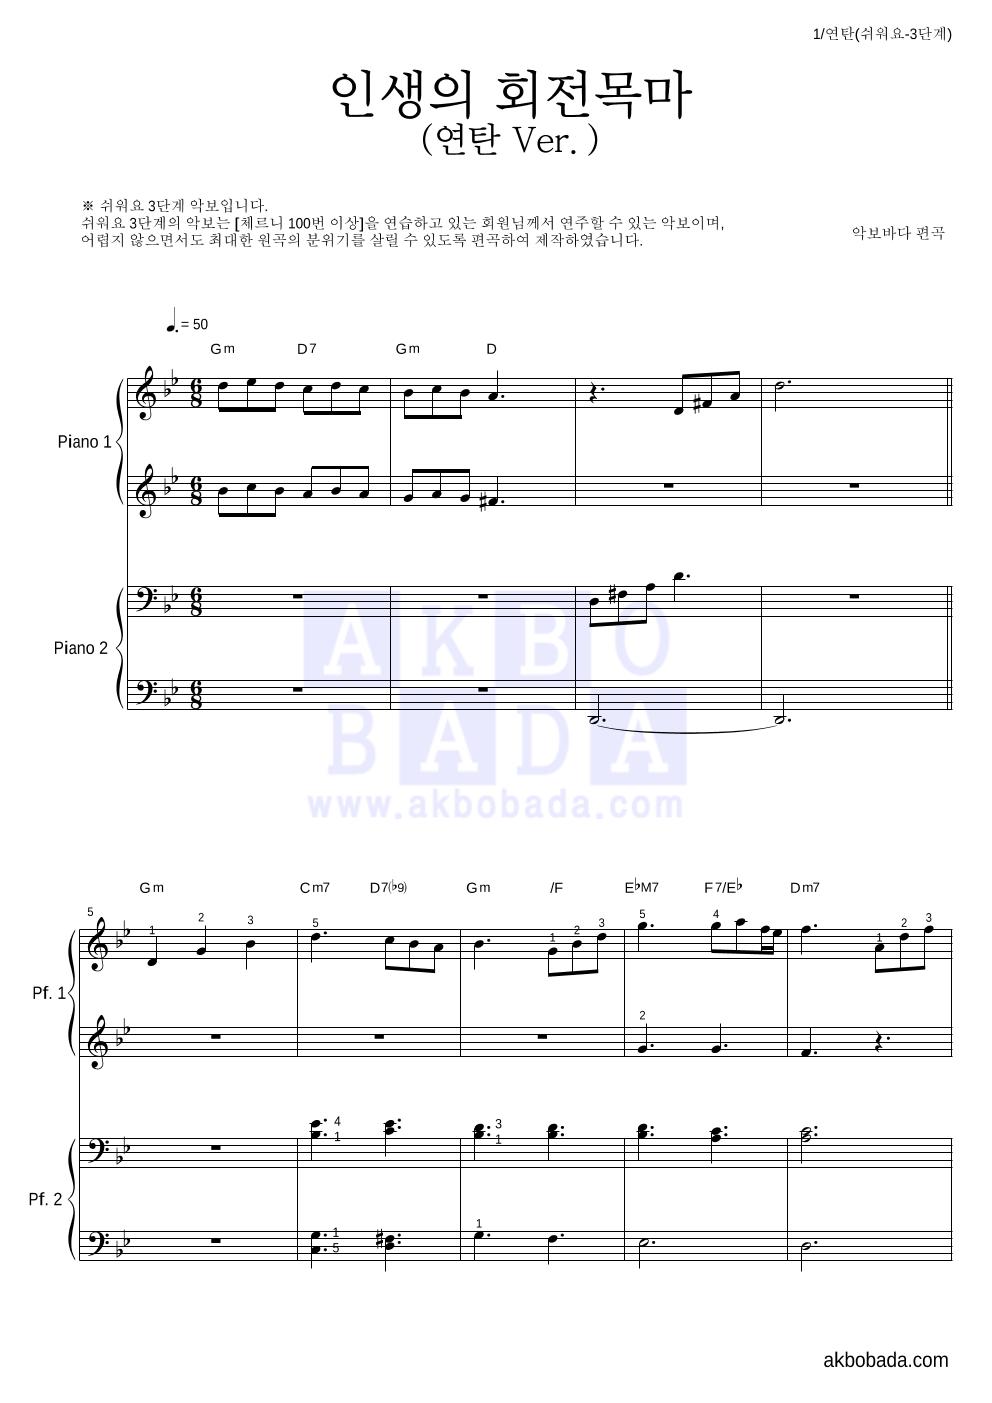 Hisaishi Joe - 인생의 회전목마 연탄곡-쉬워요 악보